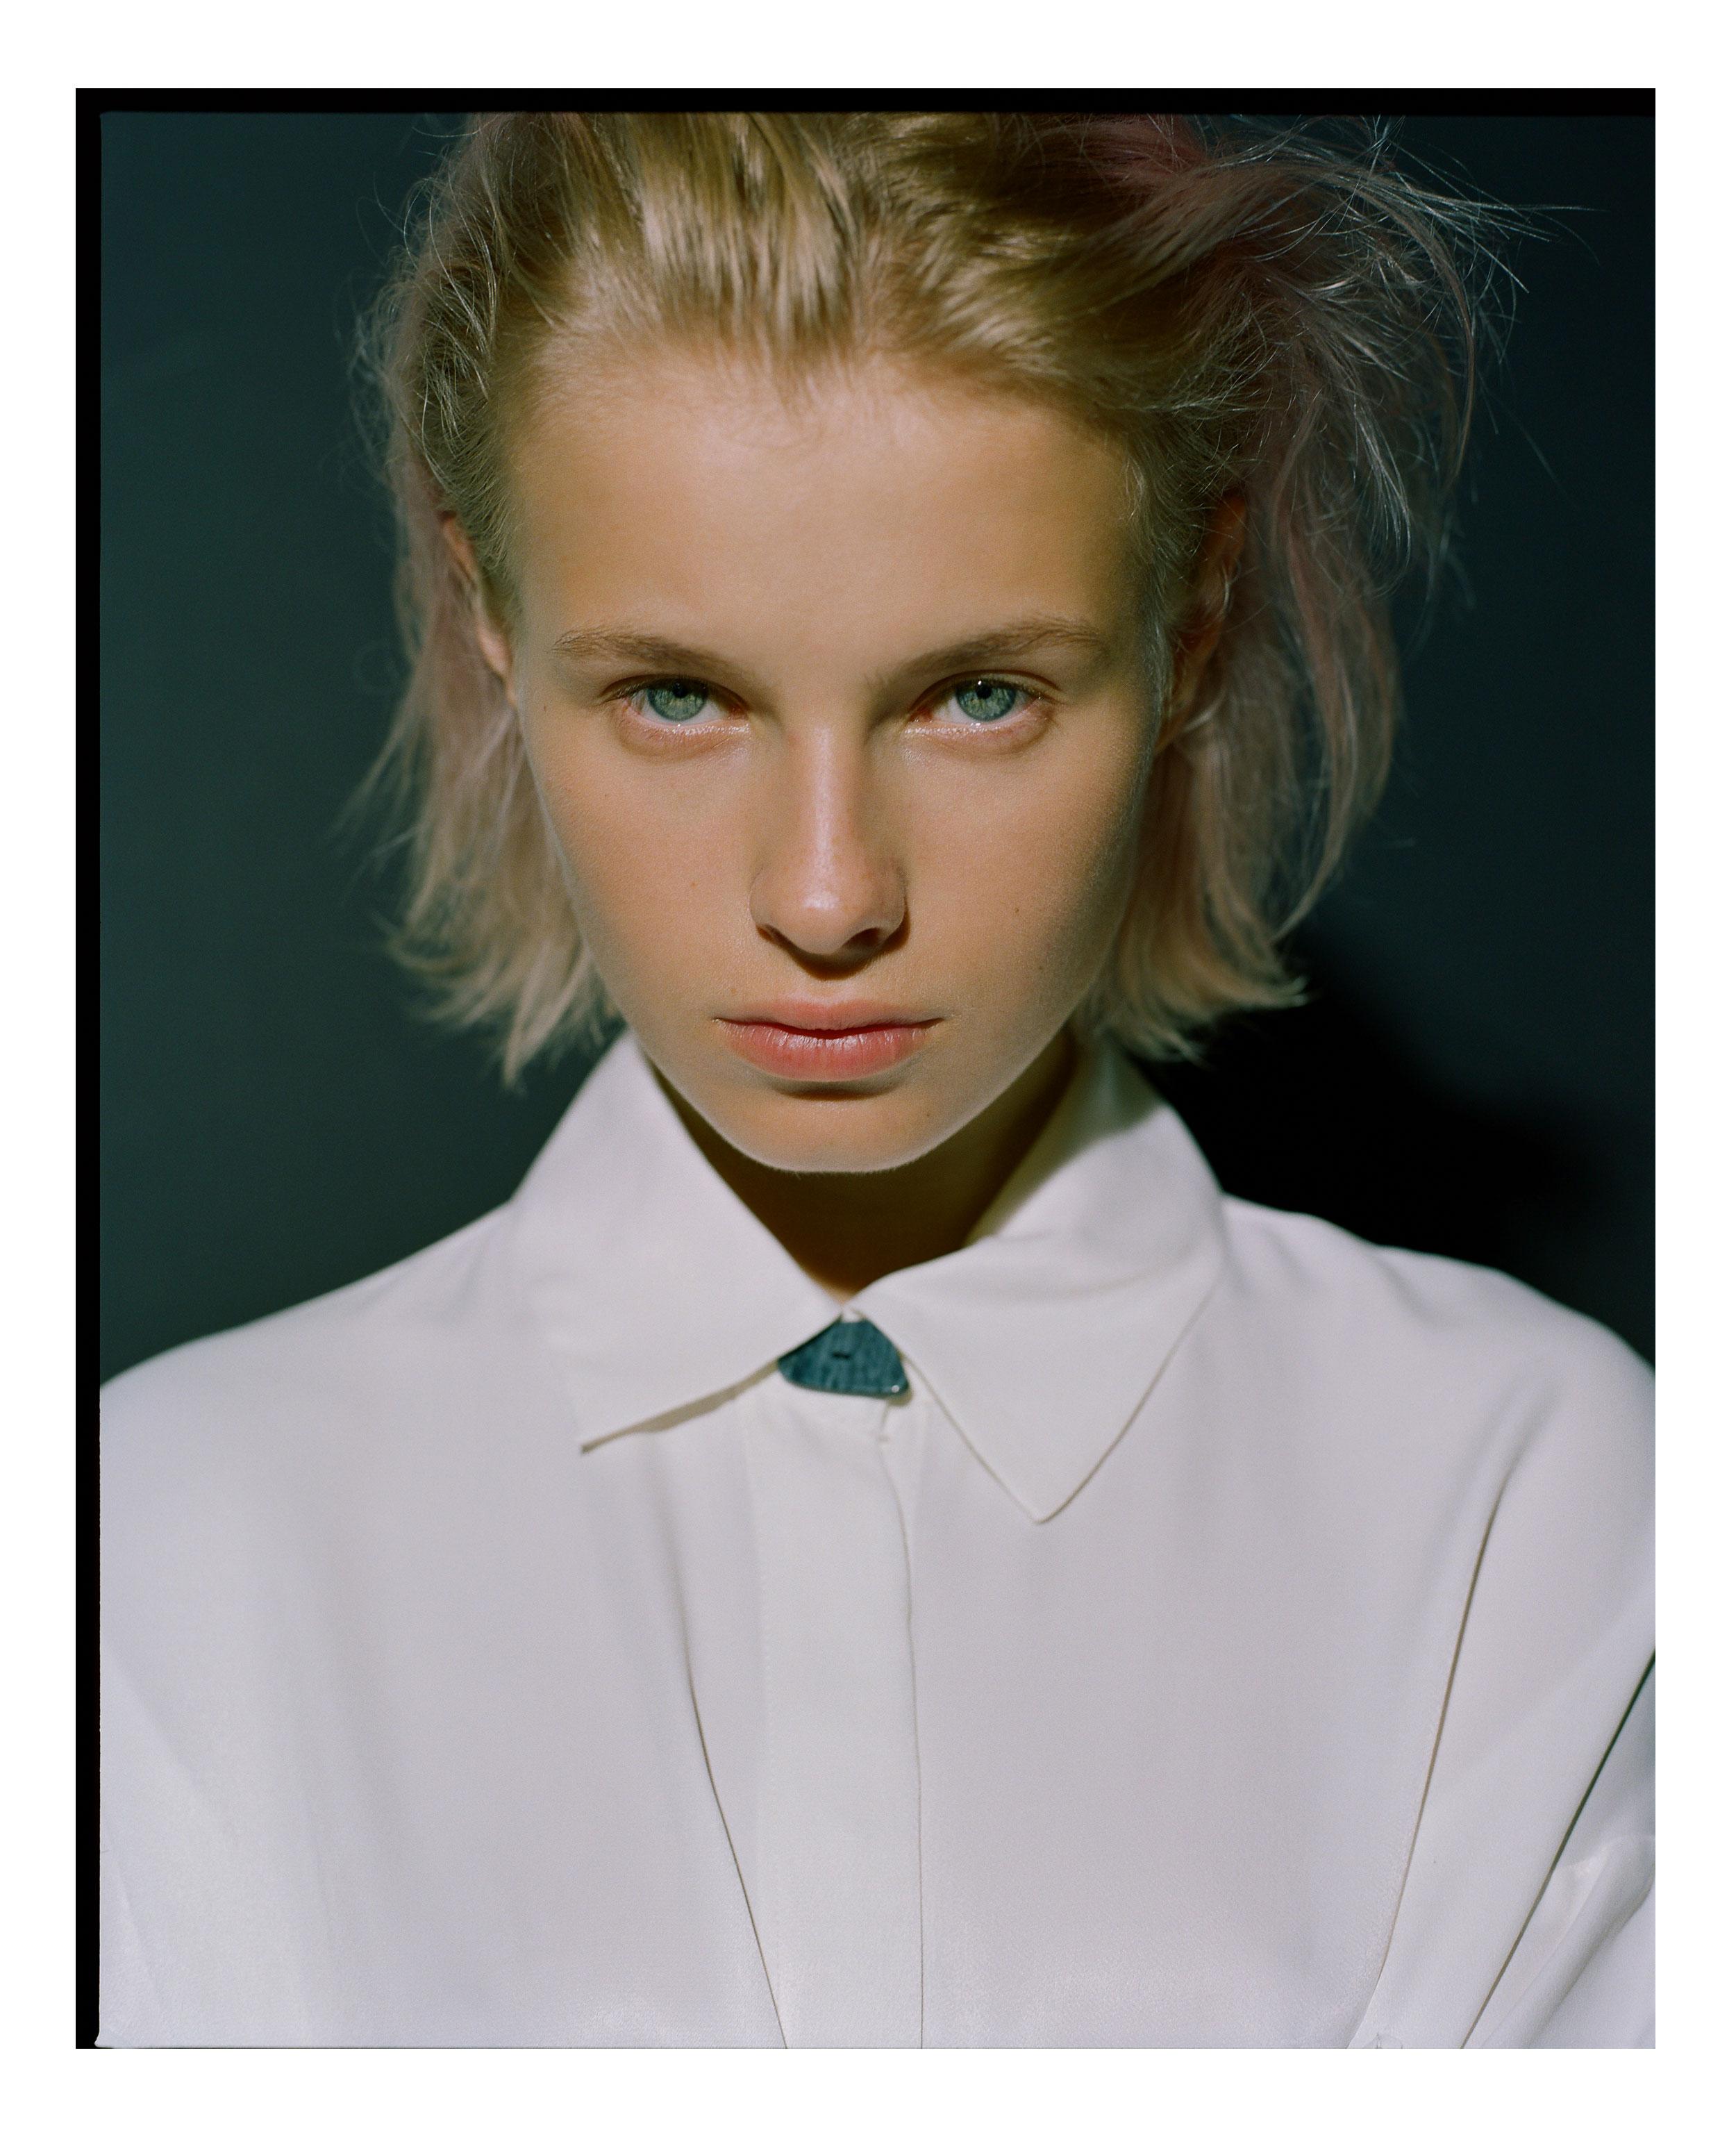 new_york_fashion_portrait_2.jpg